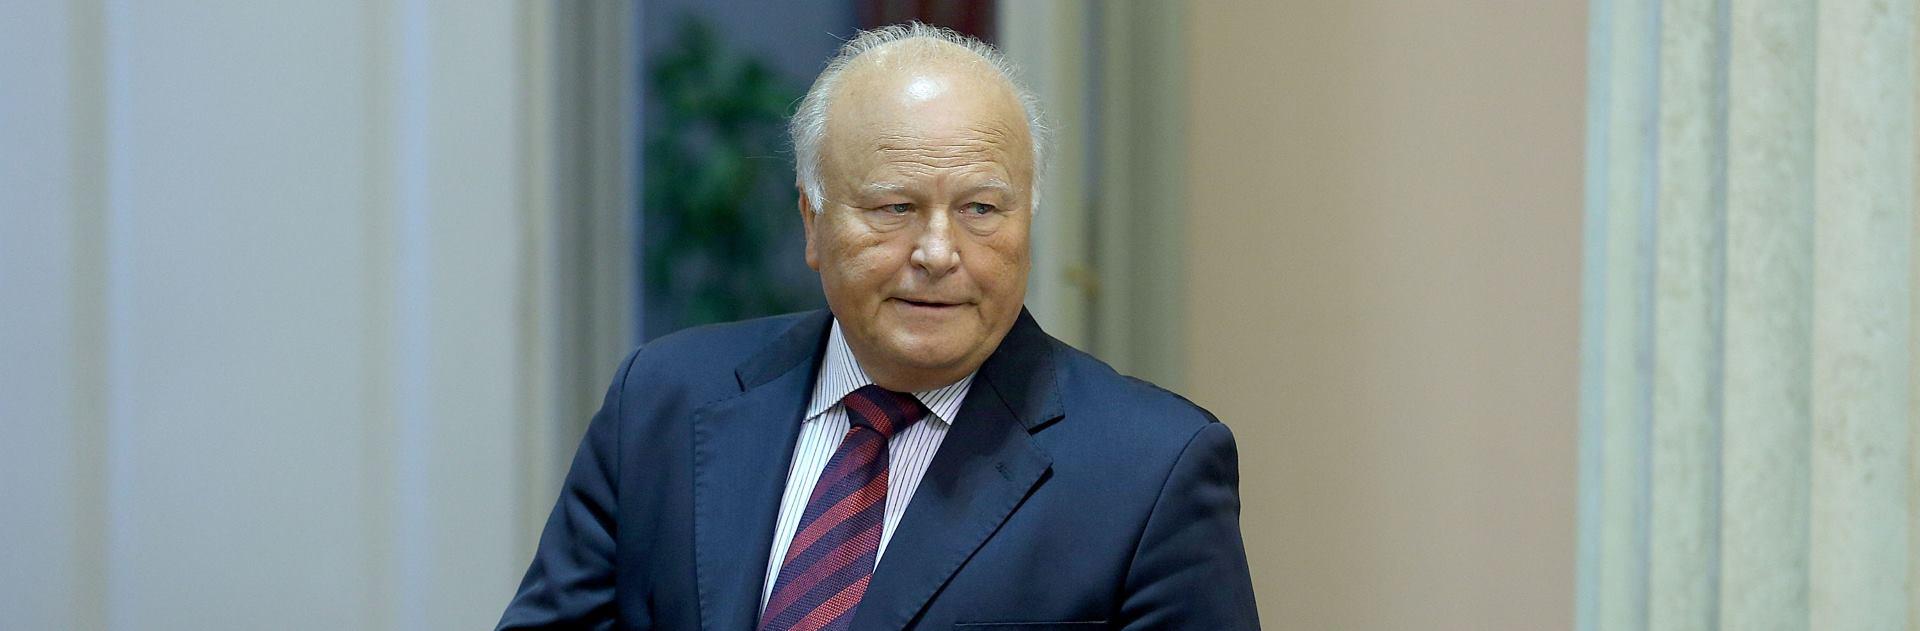 SLUČAJ LINIĆ: HDZ zatražio saborsku stanku